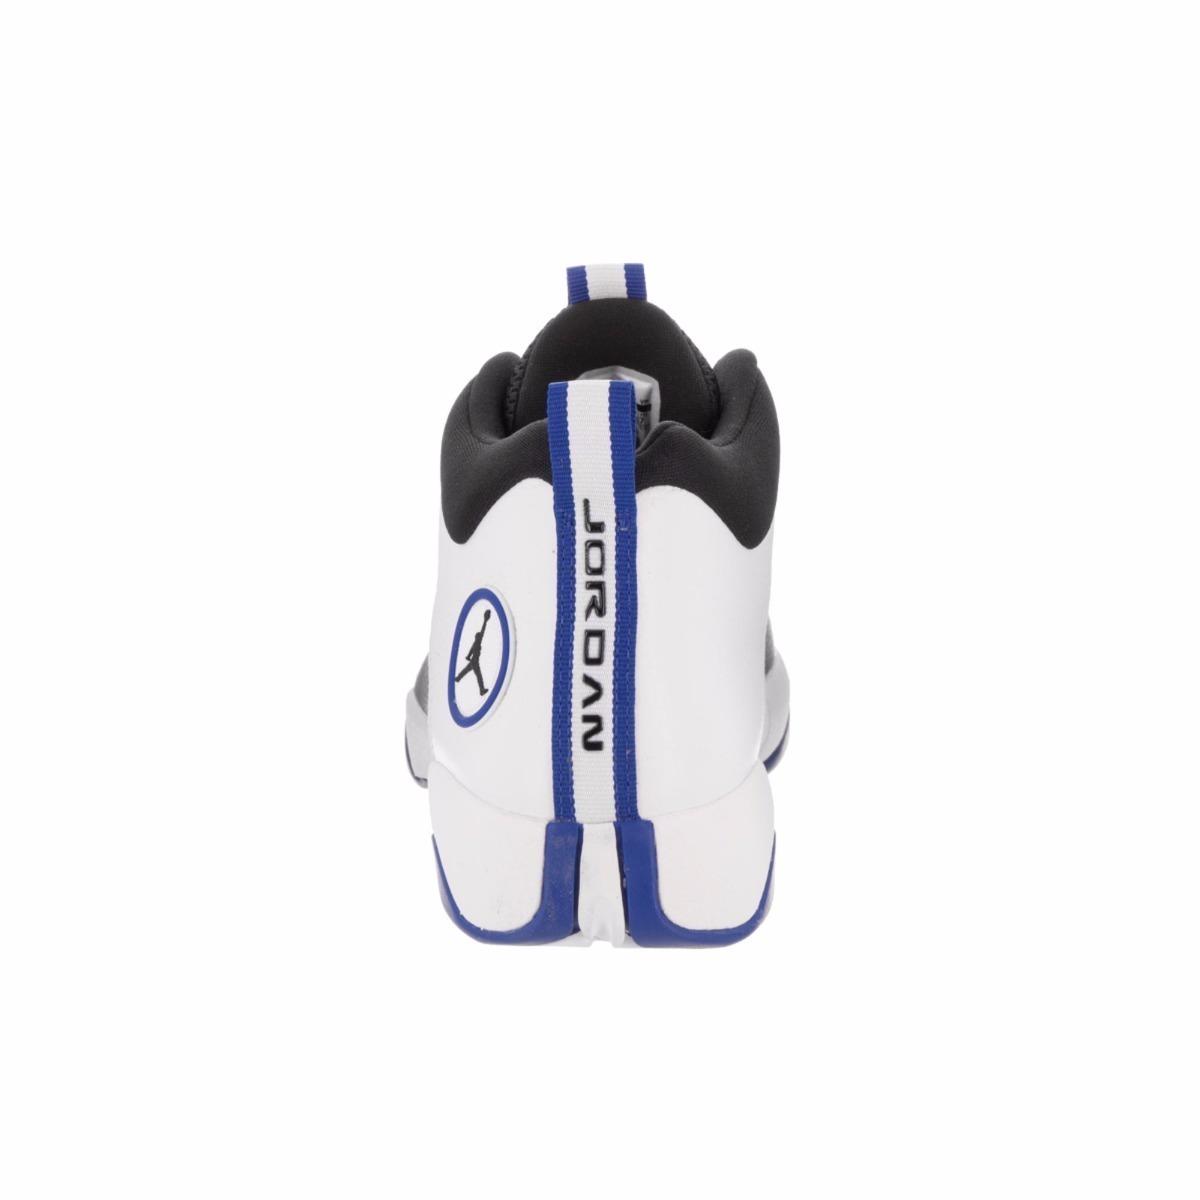 f56ba32f43f5 Tenis Nike Air Jordan Jumpman Pro Q 932687-107 Originales ...